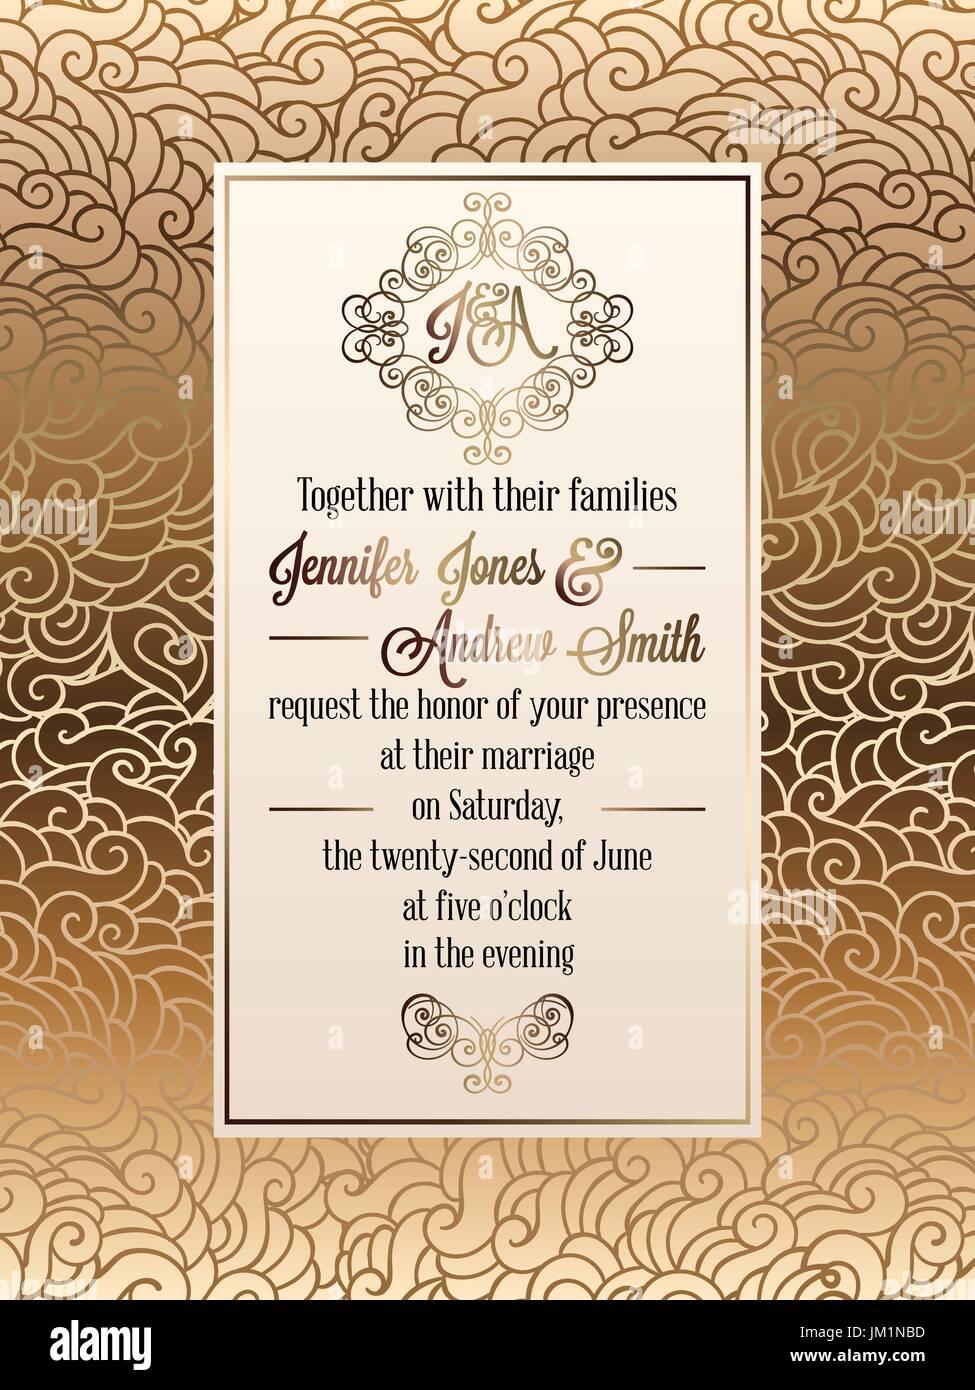 Vintage Baroque Style Wedding Invitation Card Template